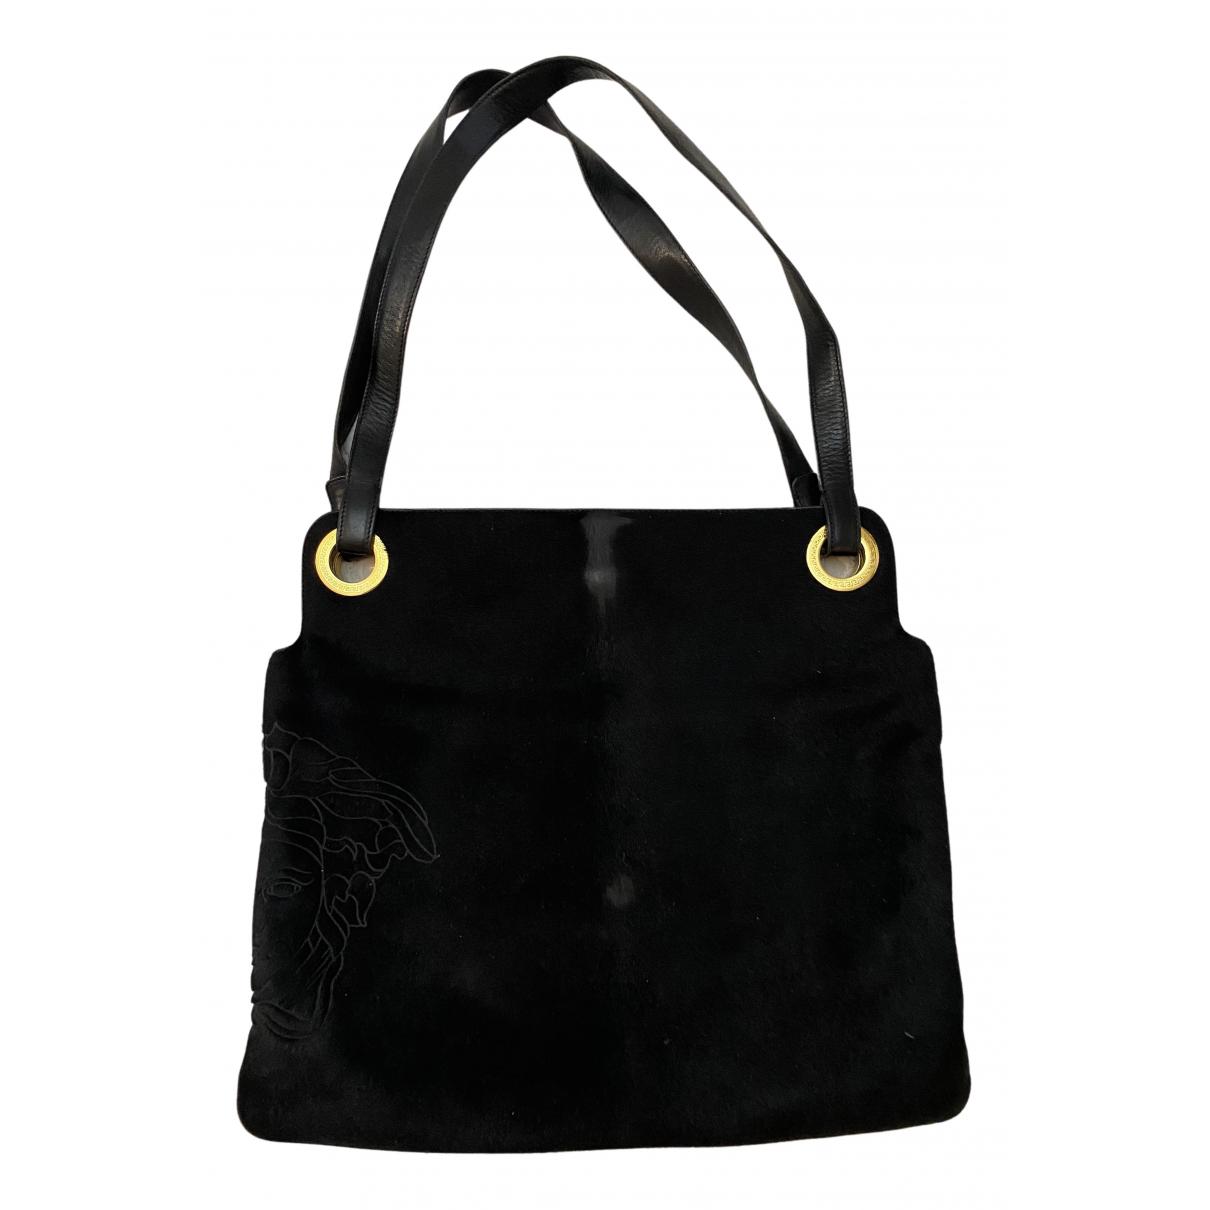 Gianni Versace N Black Pony-style calfskin handbag for Women N